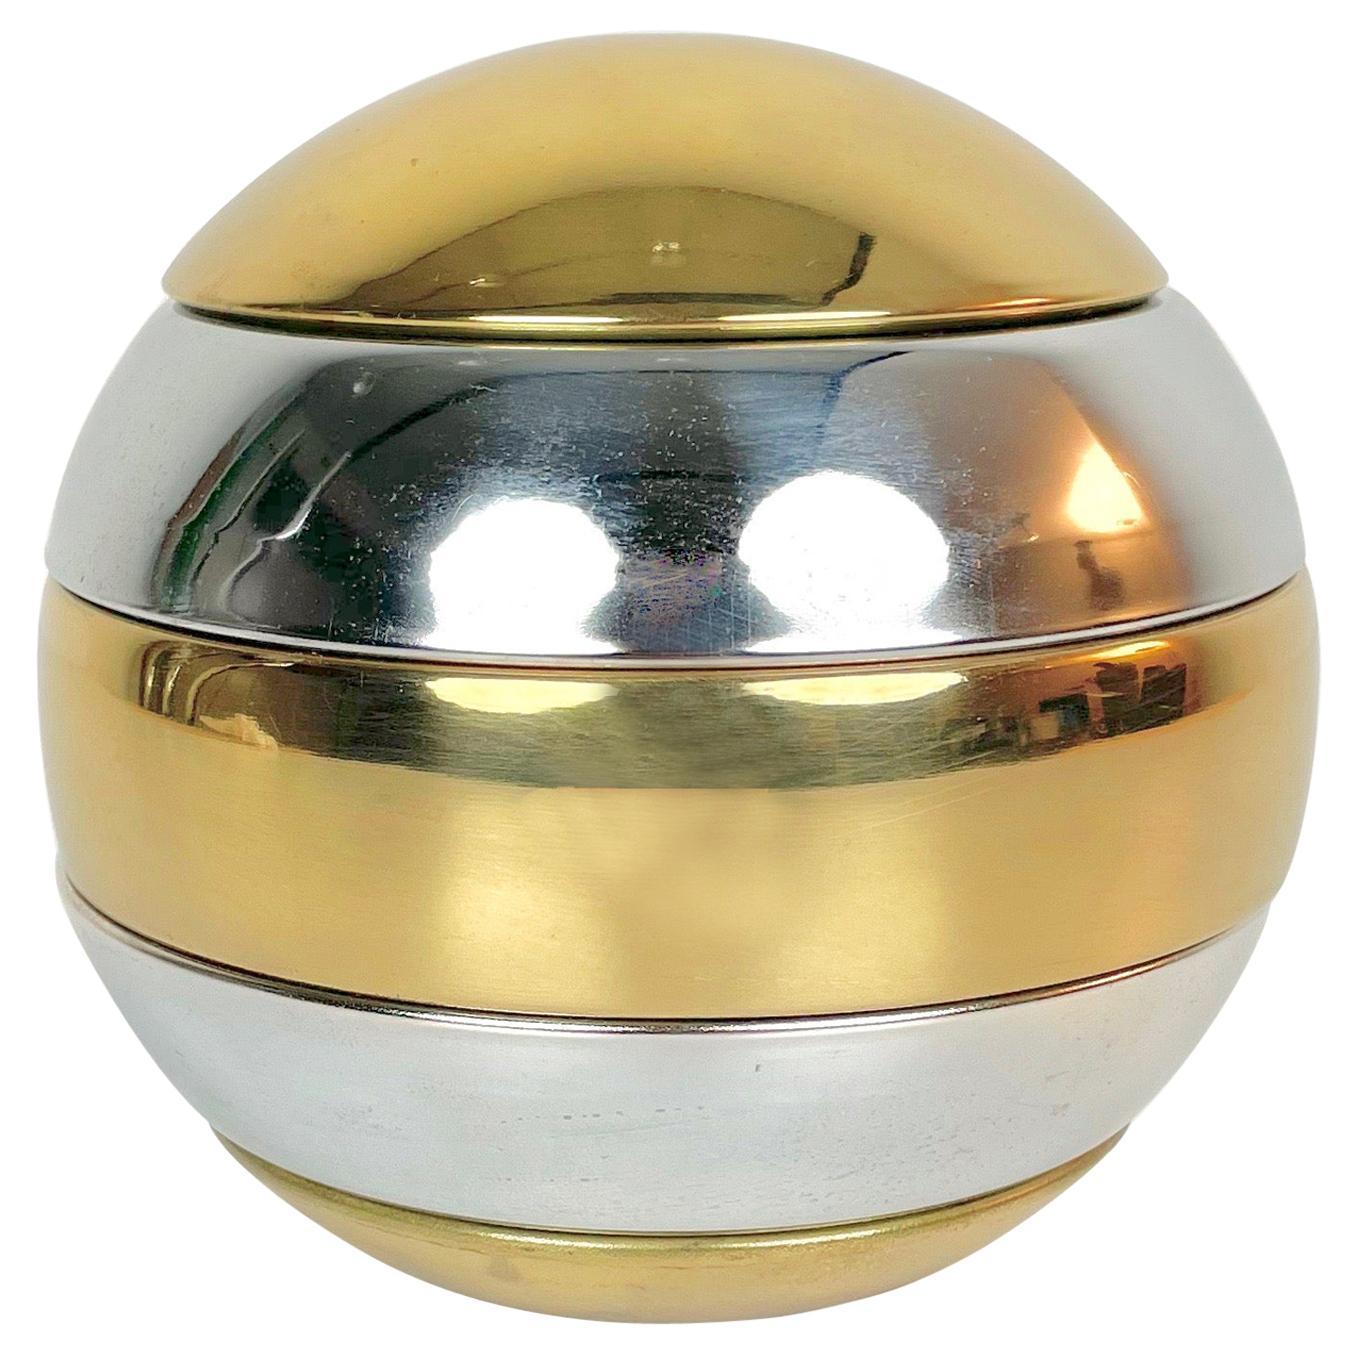 Stacked Brass & Chrome Globe Ashtray Tommaso Barbi Style, Italy, 1970s